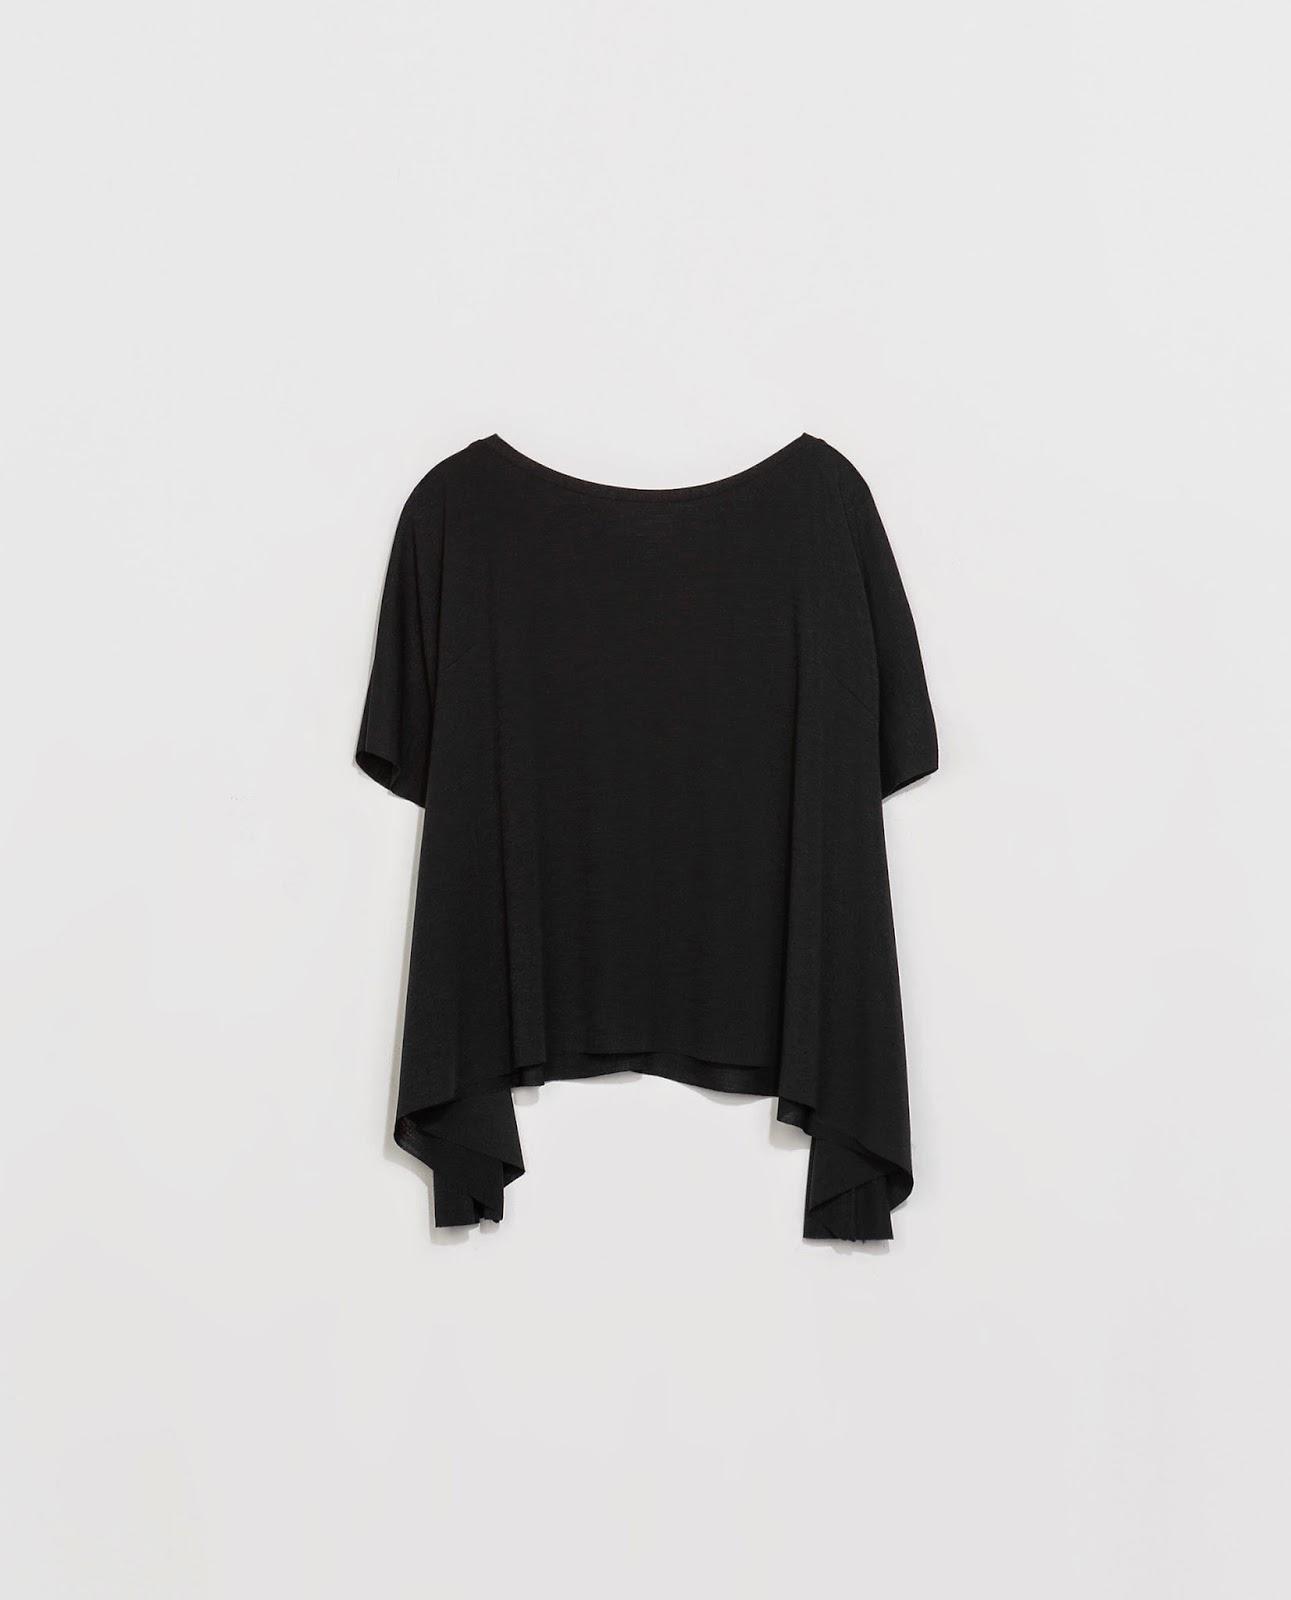 Camiseta corte japones de Zara, black, street style, t-shirt